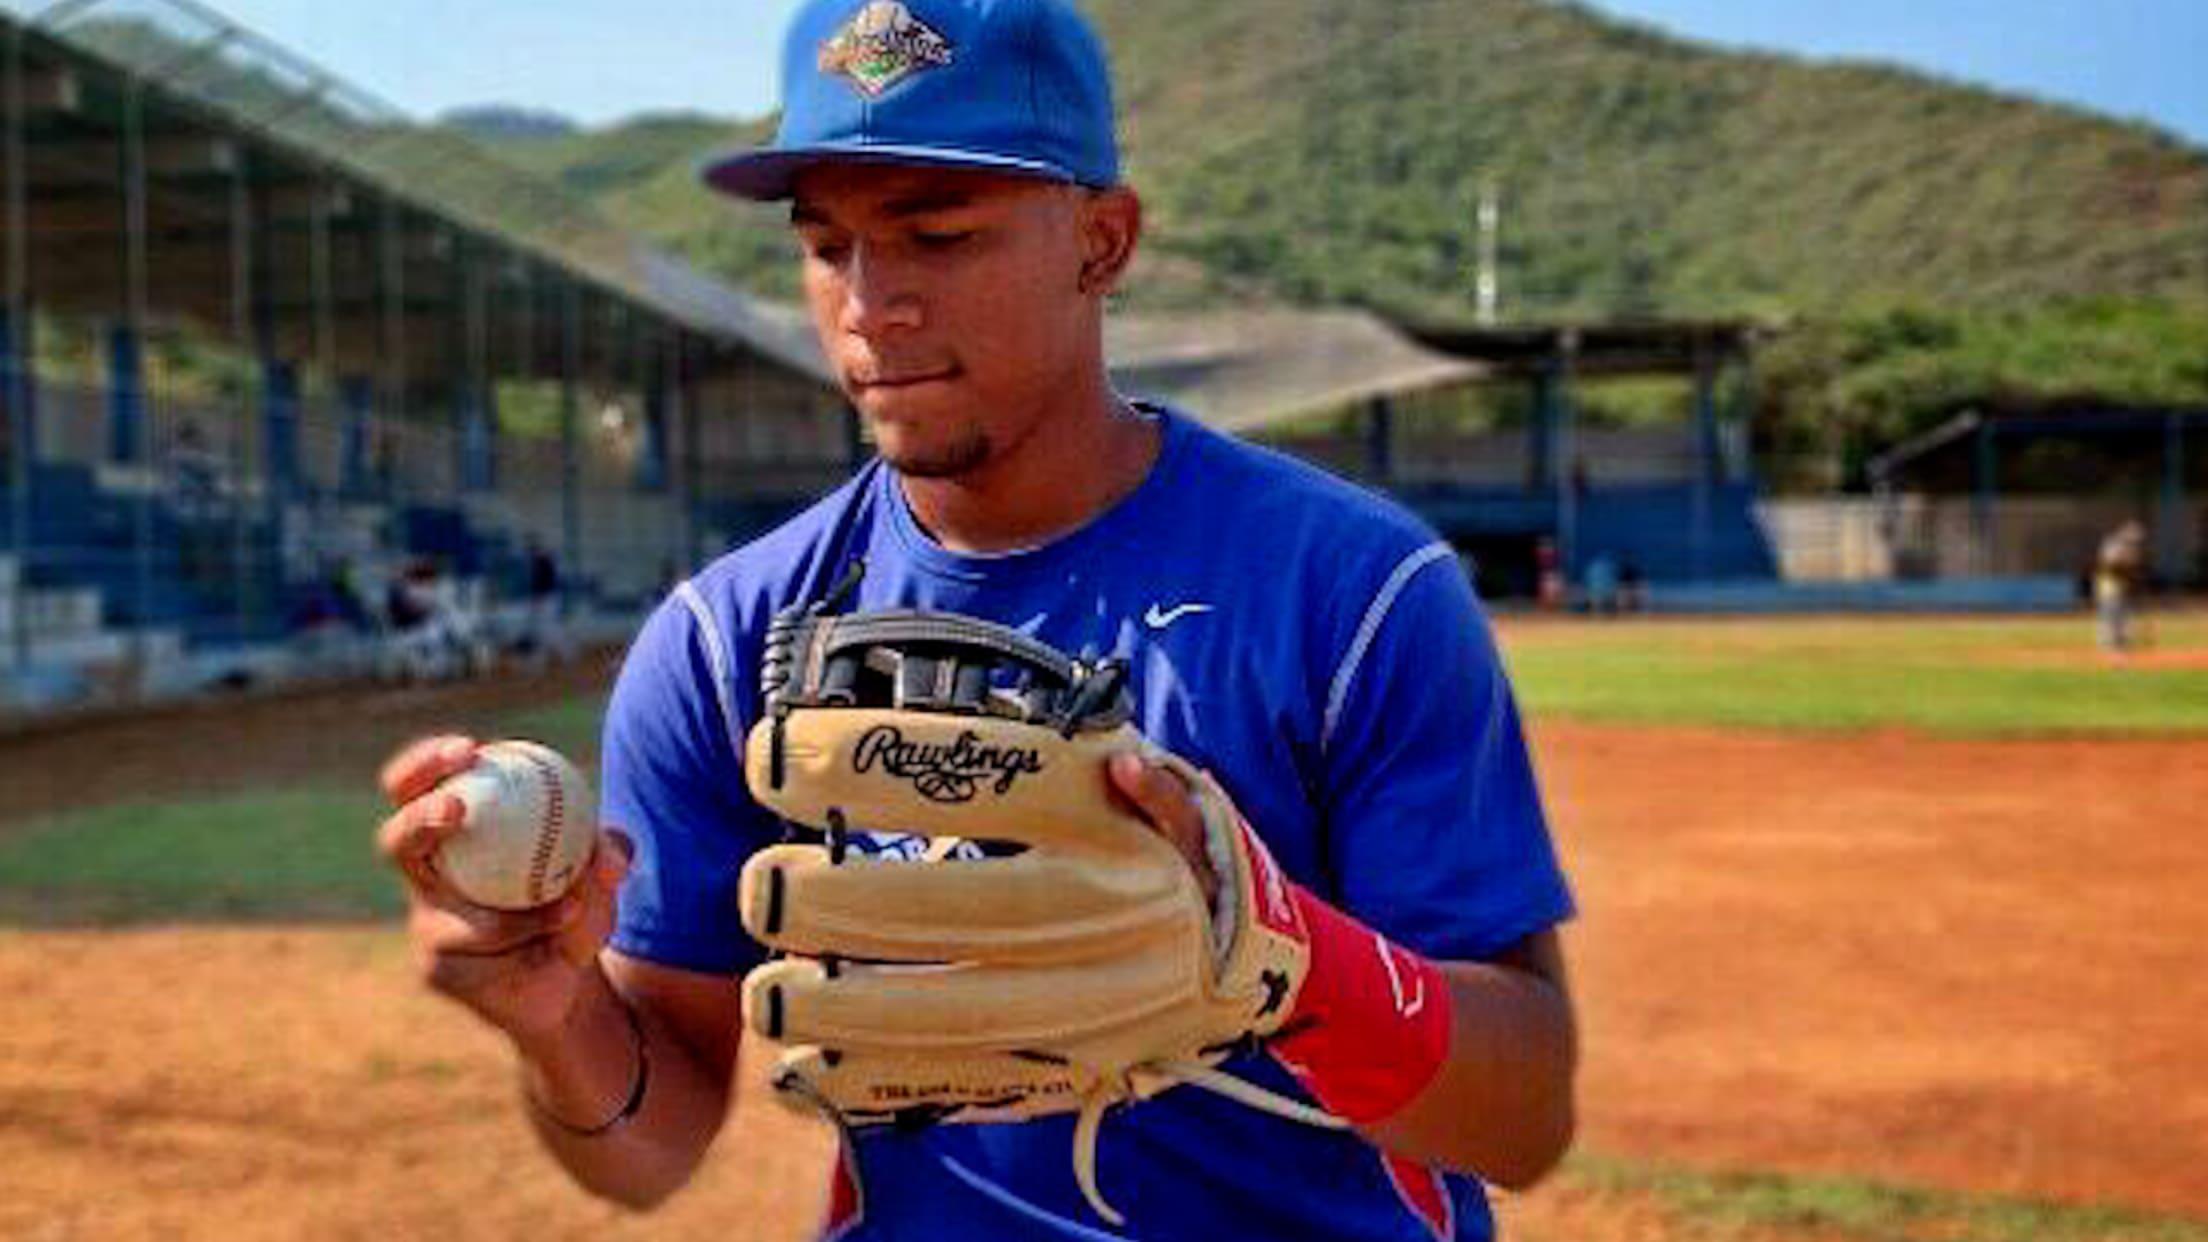 Top Prospects: Maximo Acosta